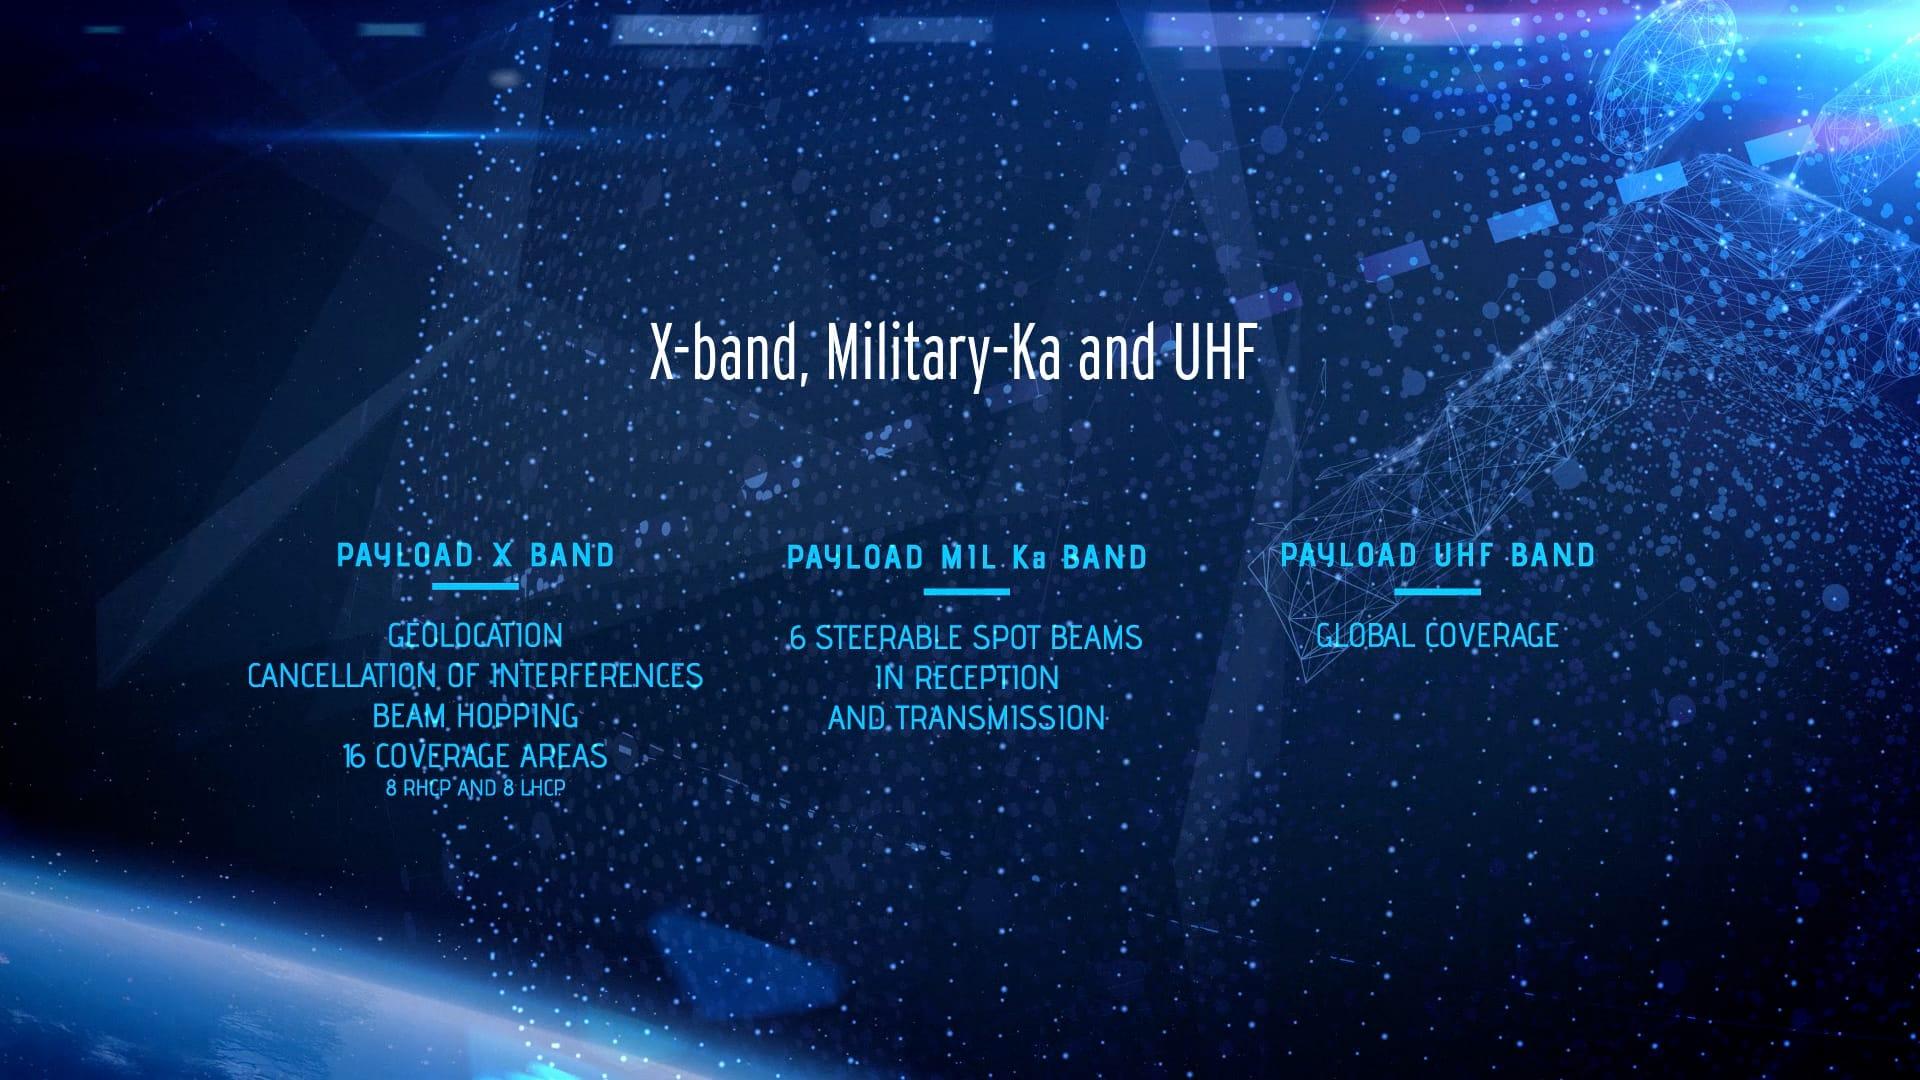 Next Generation Satellite Bands